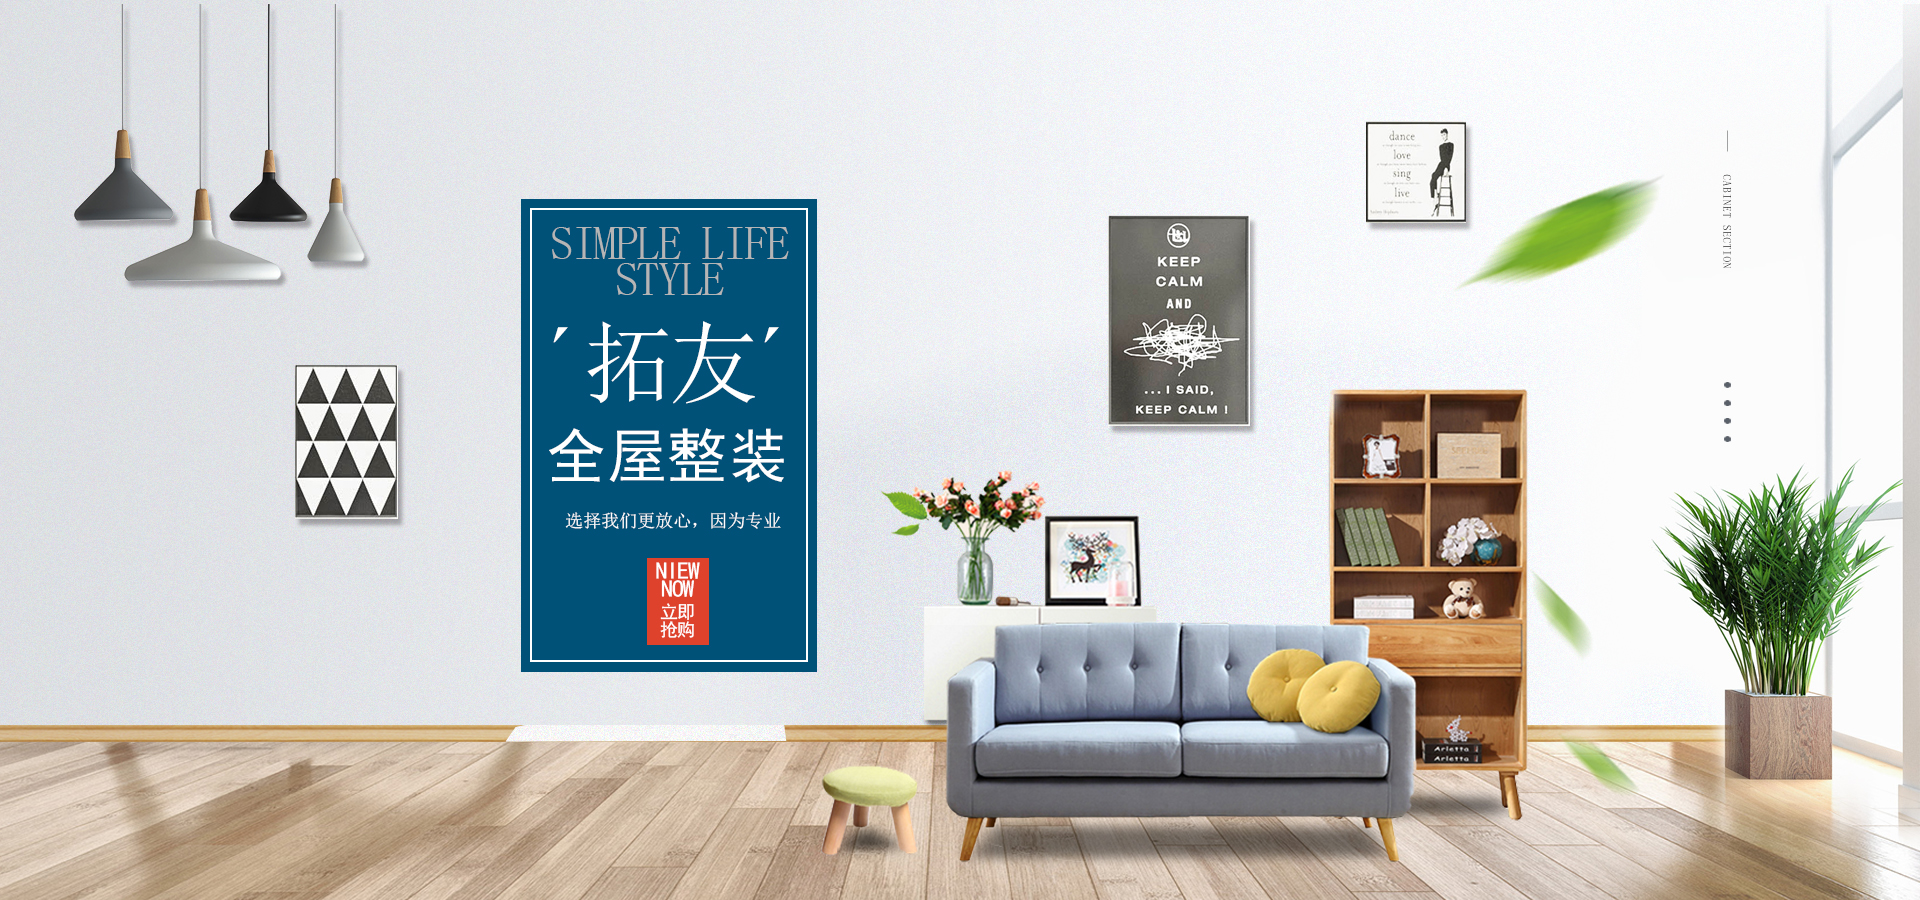 lehu vip板式家具   lehu vip集成灶